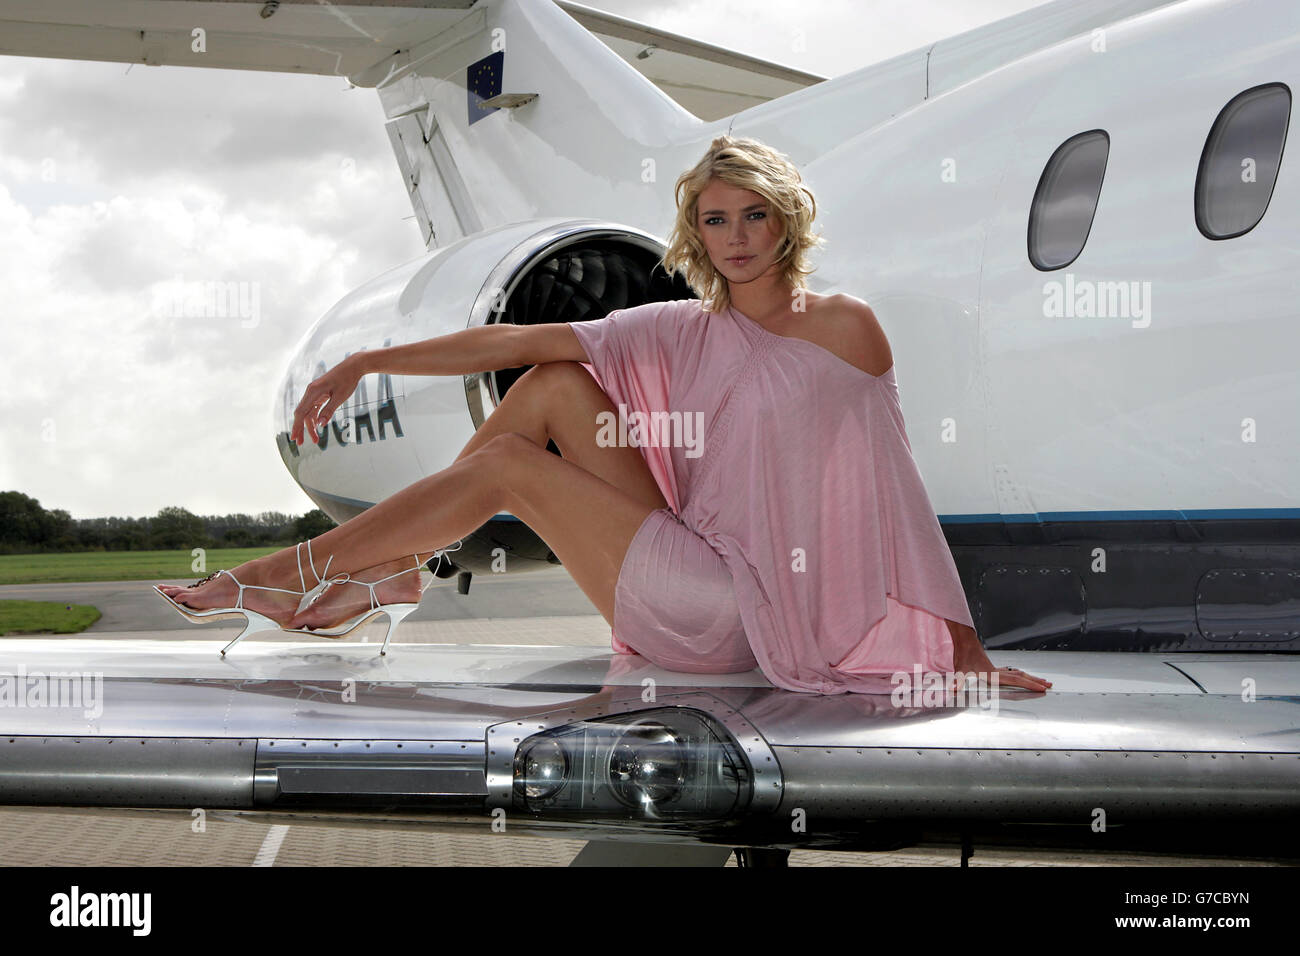 Jodie Kidd - Club 328 - Stock Image